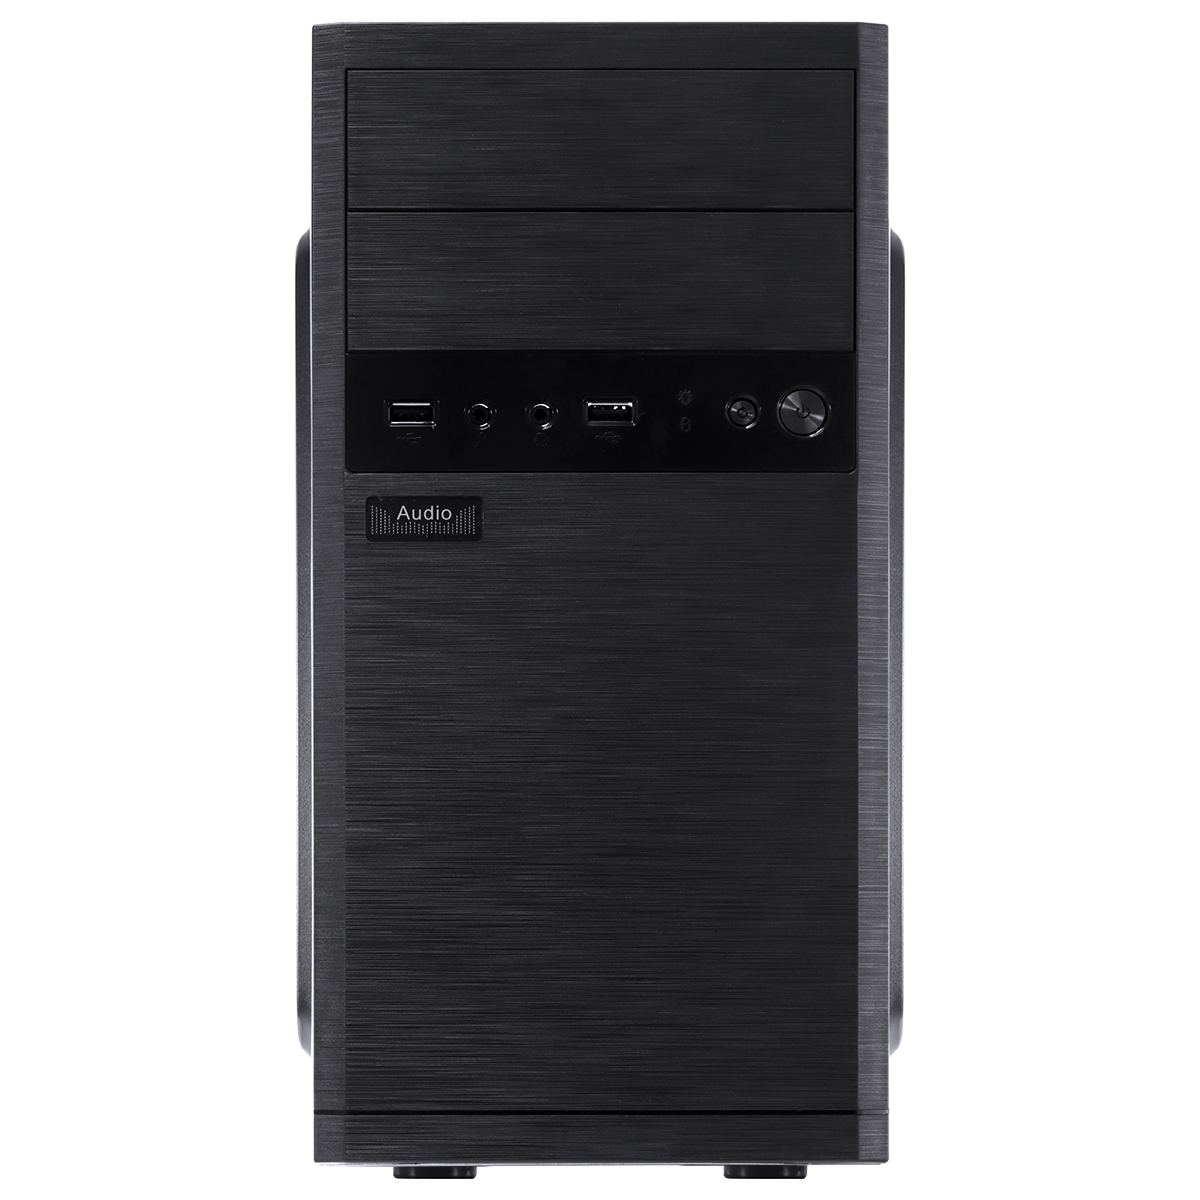 COMPUTADOR BUSINESS B500 - I5 4570 3.2GHZ 8GB DDR3 SSD 120GB HDMI/VGA FONTE 300W  - Audio Video & cia